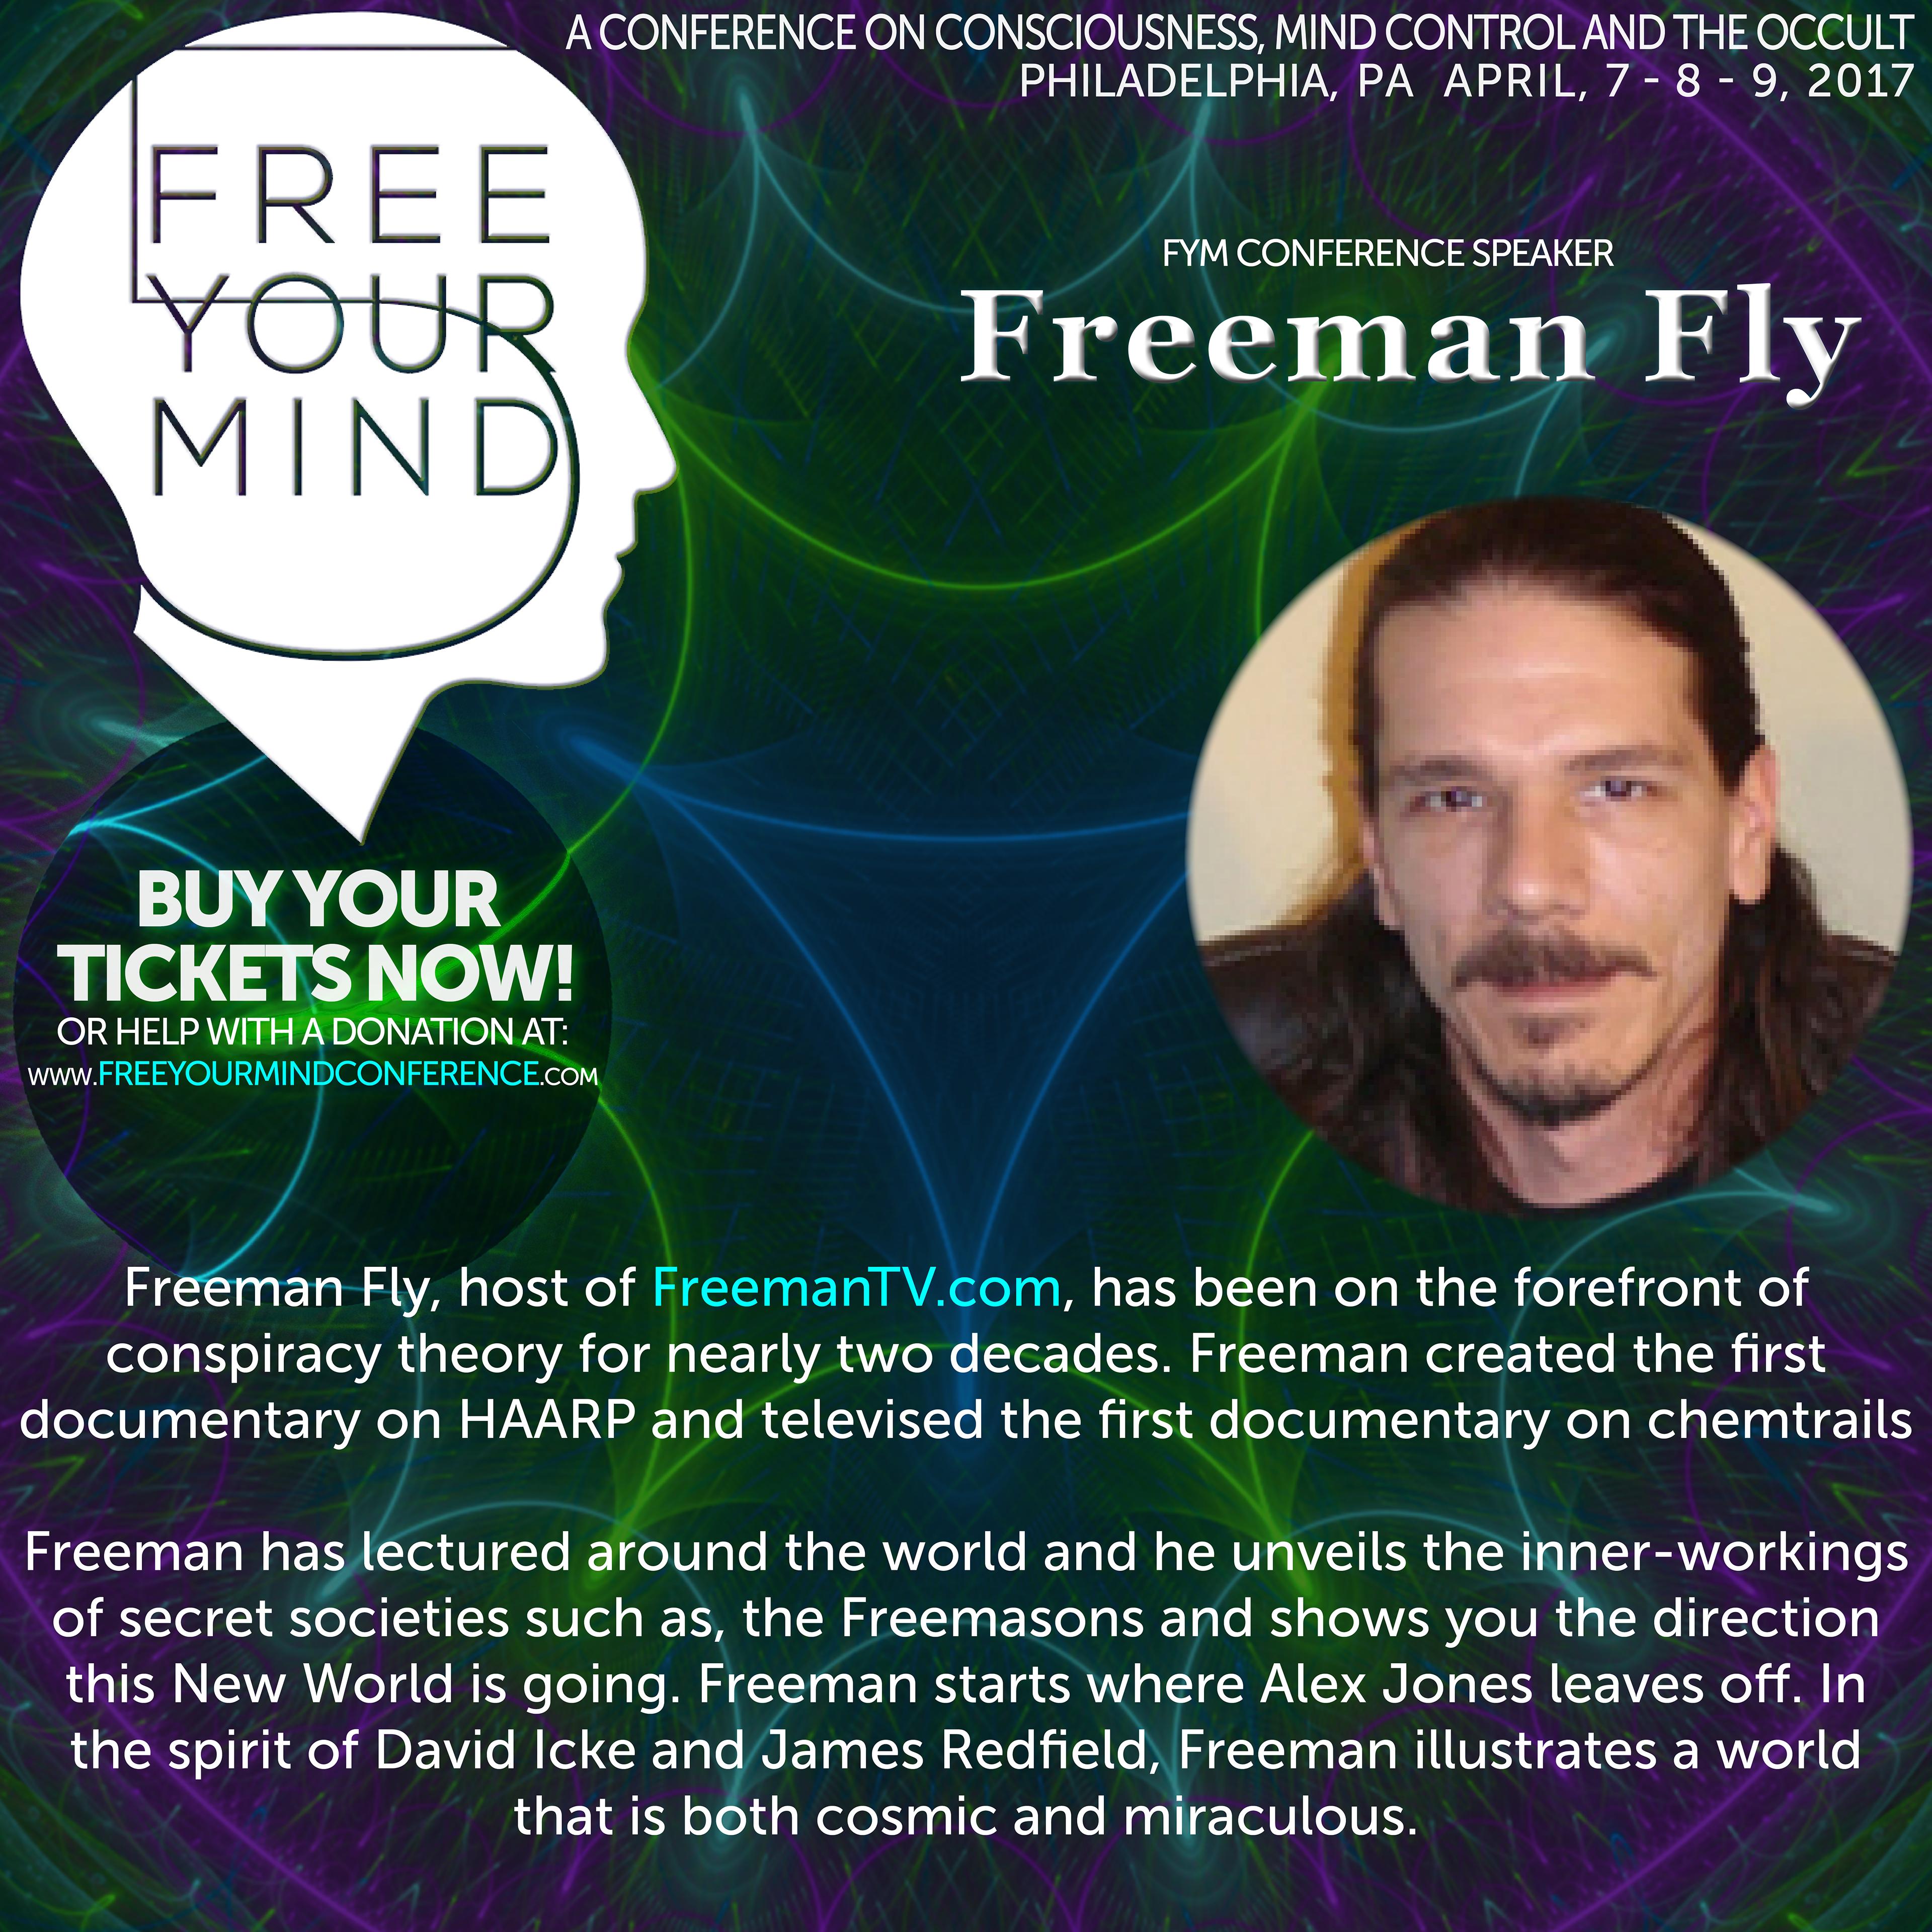 Flyer Design Free Your Mind Conference 5 On Behance